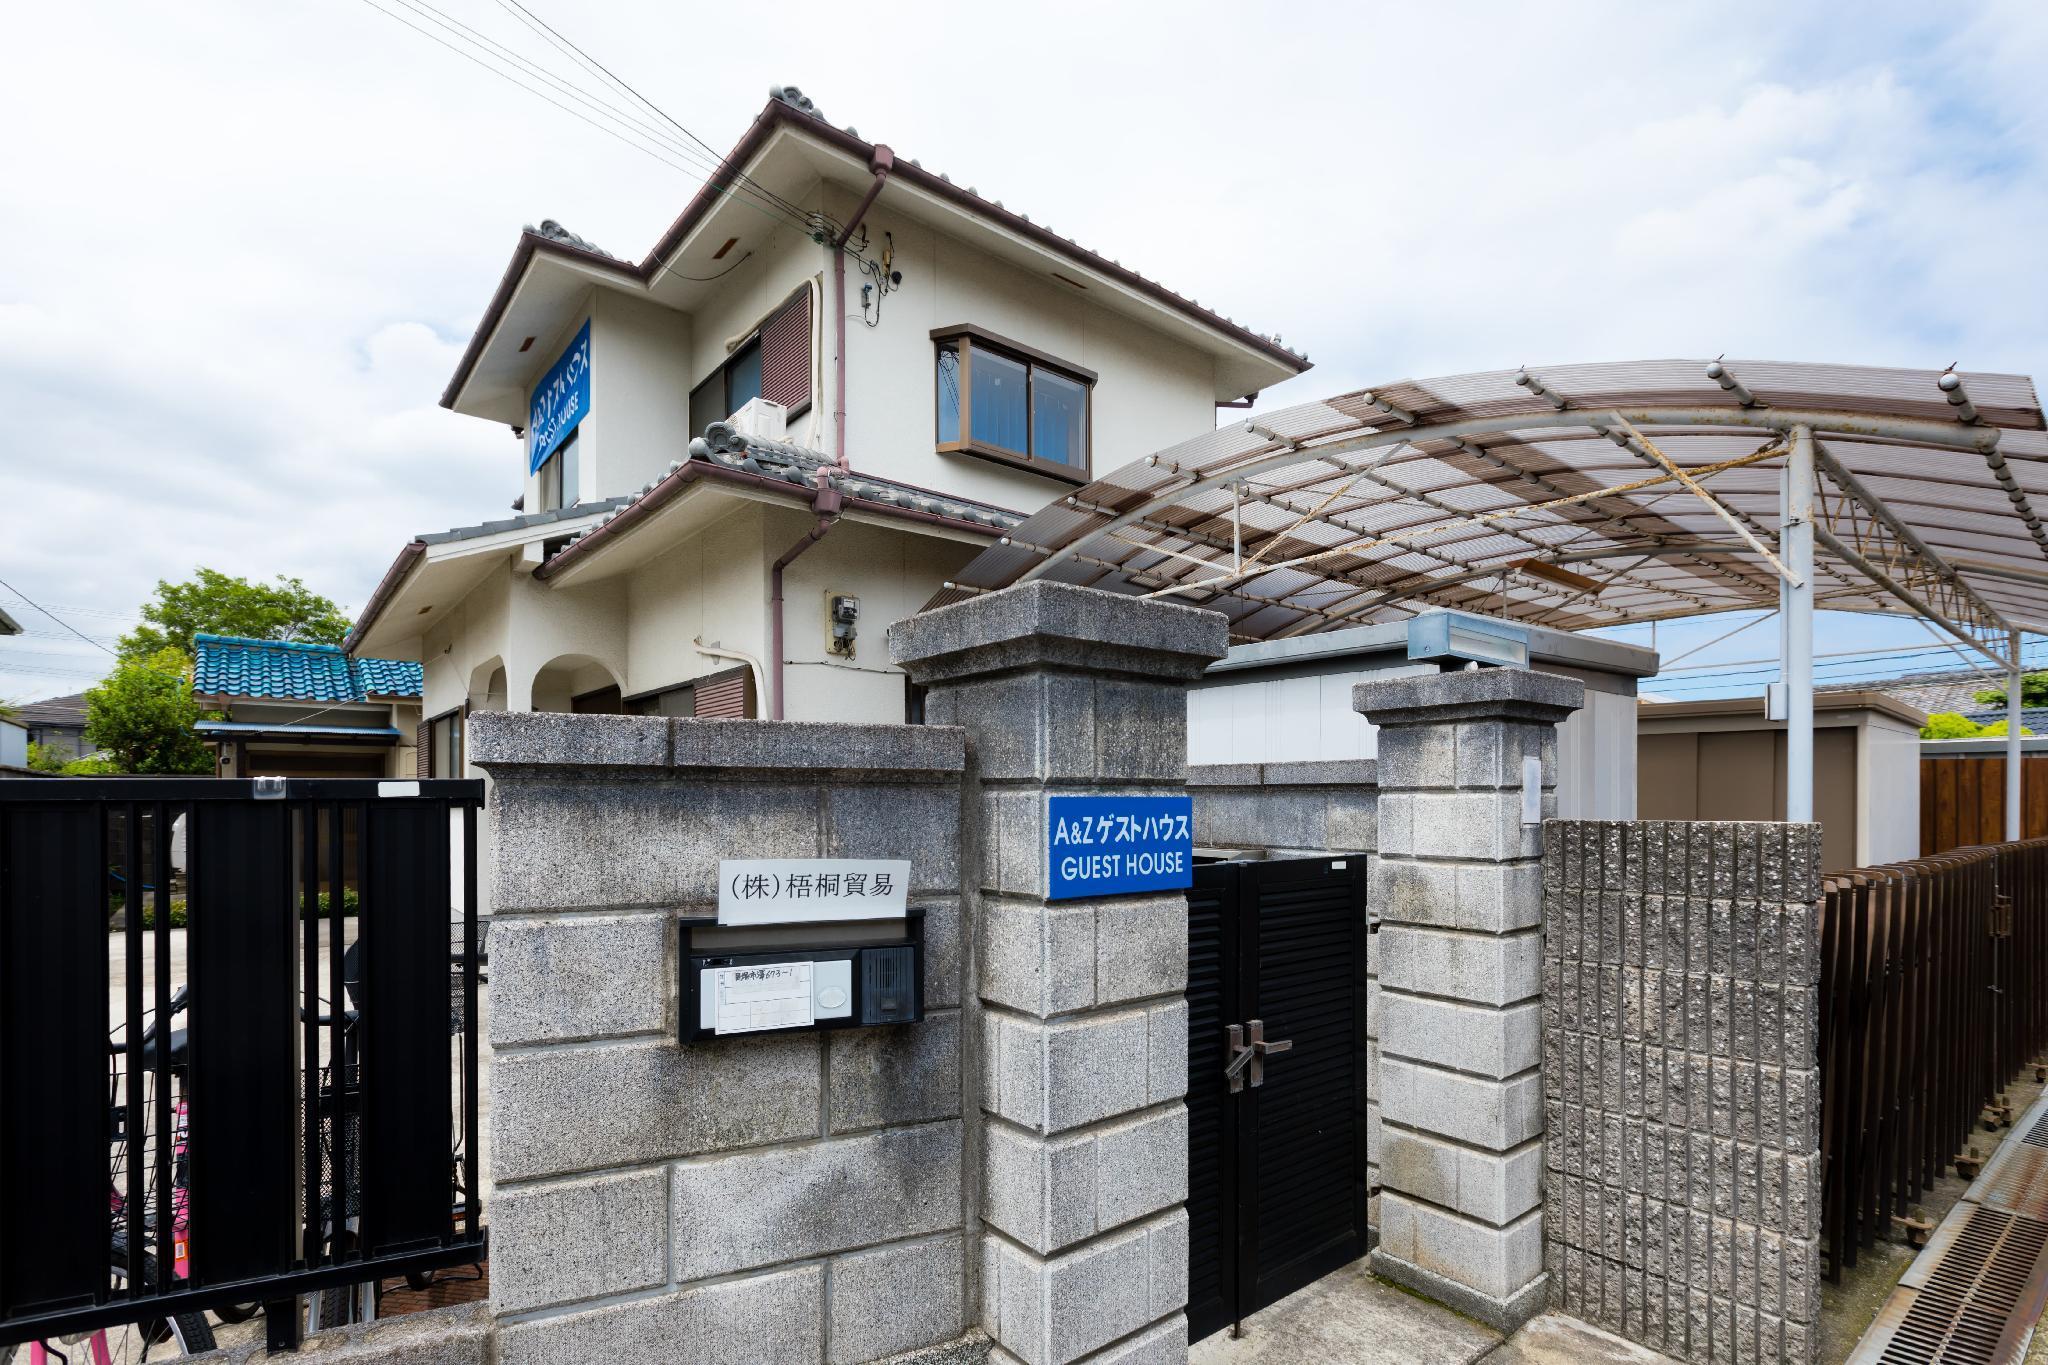 A&Z GUEST HOUSE